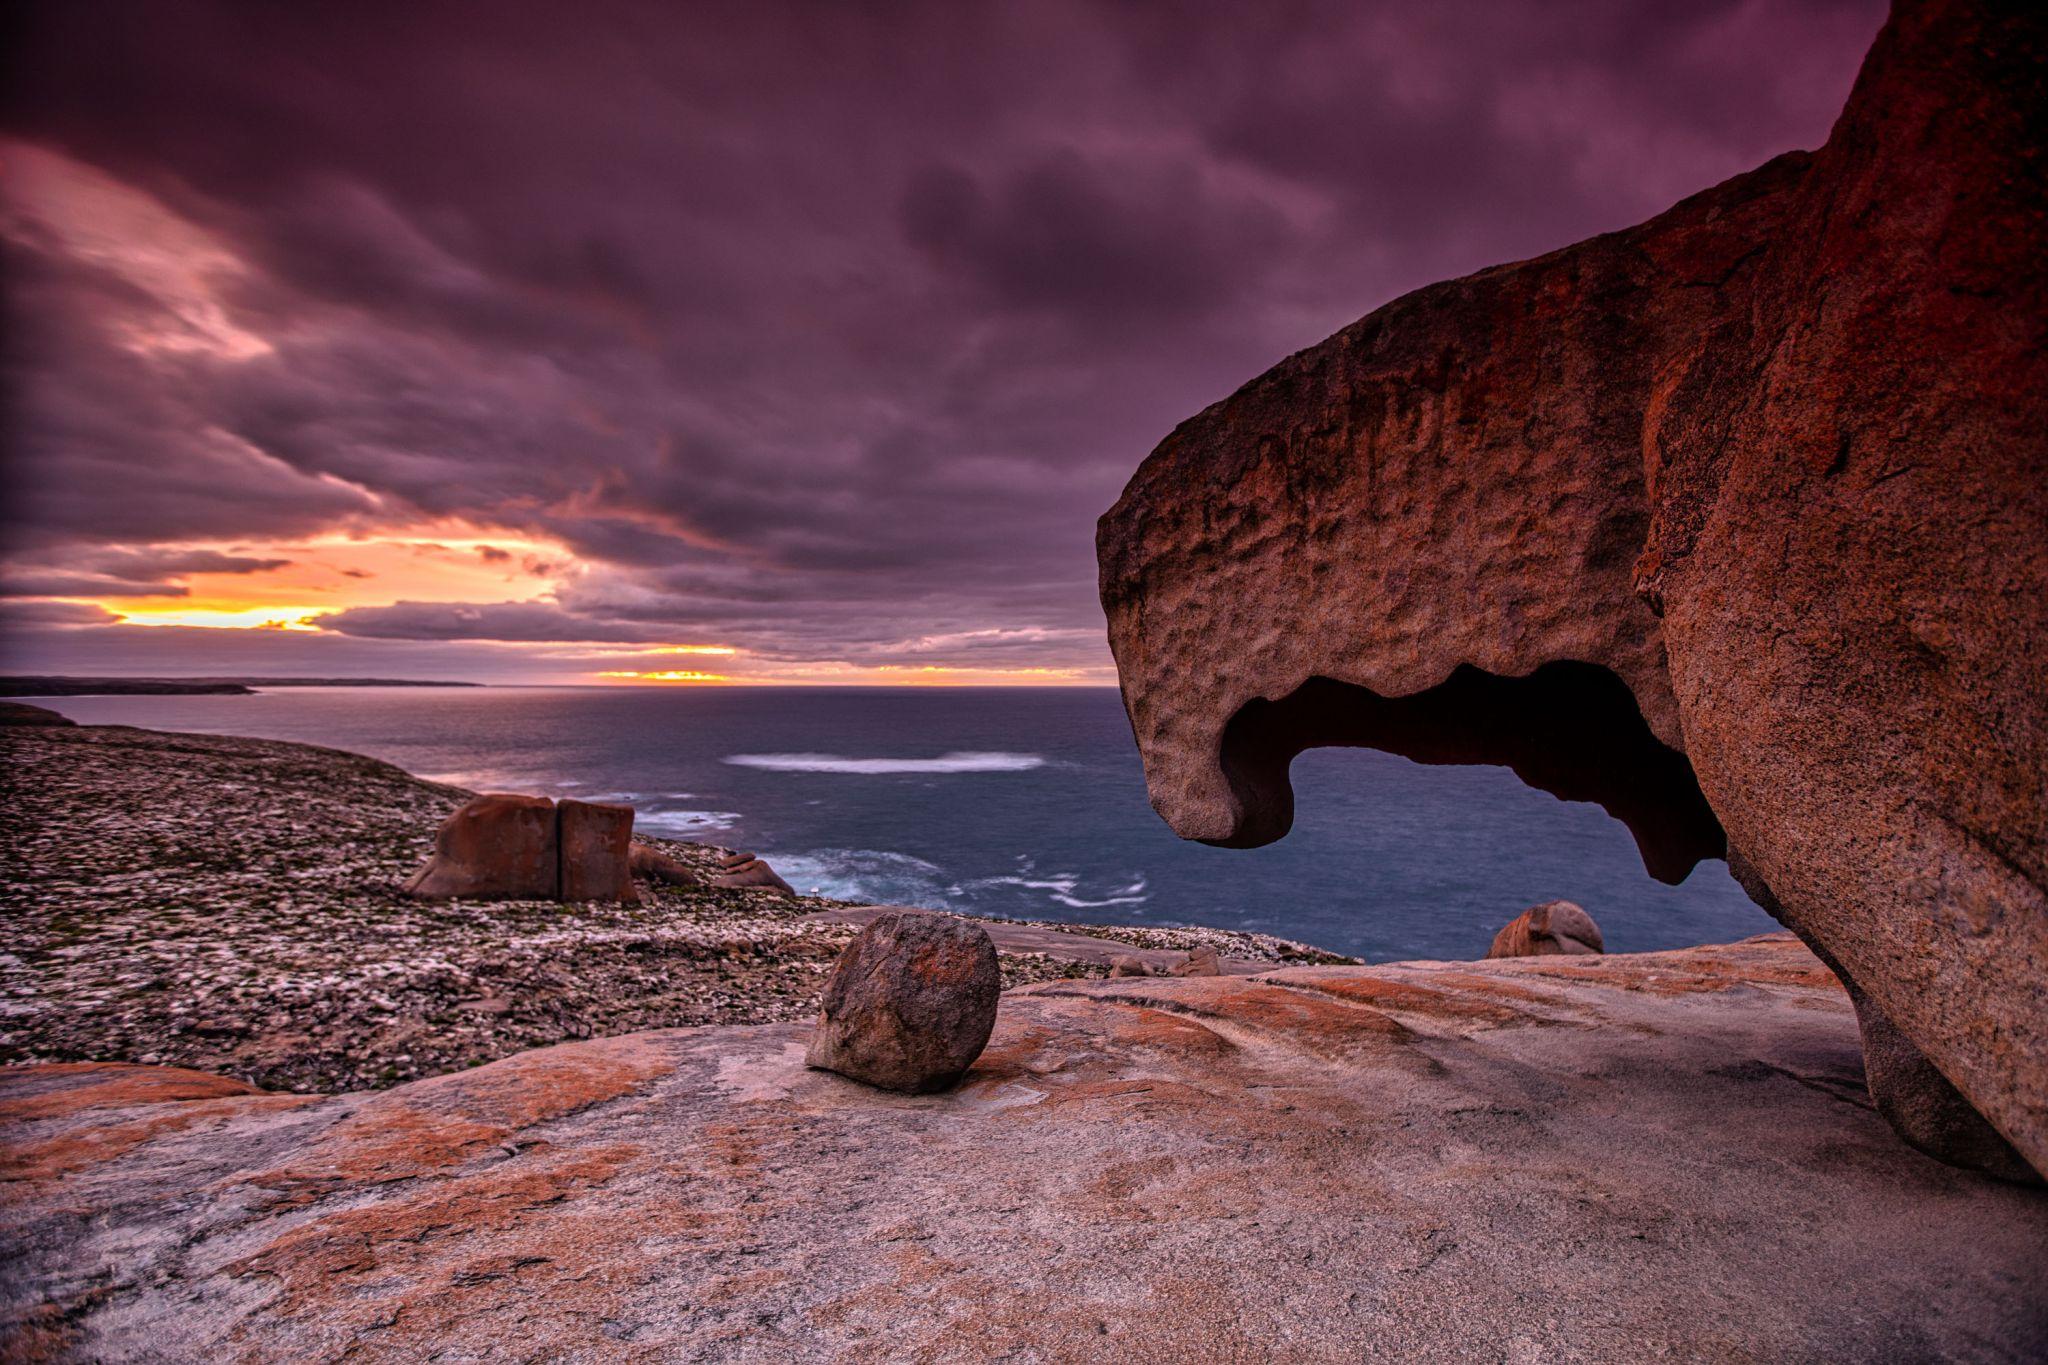 The Remarkable Rocks, 'Hook', Kangaroo Island, Australia